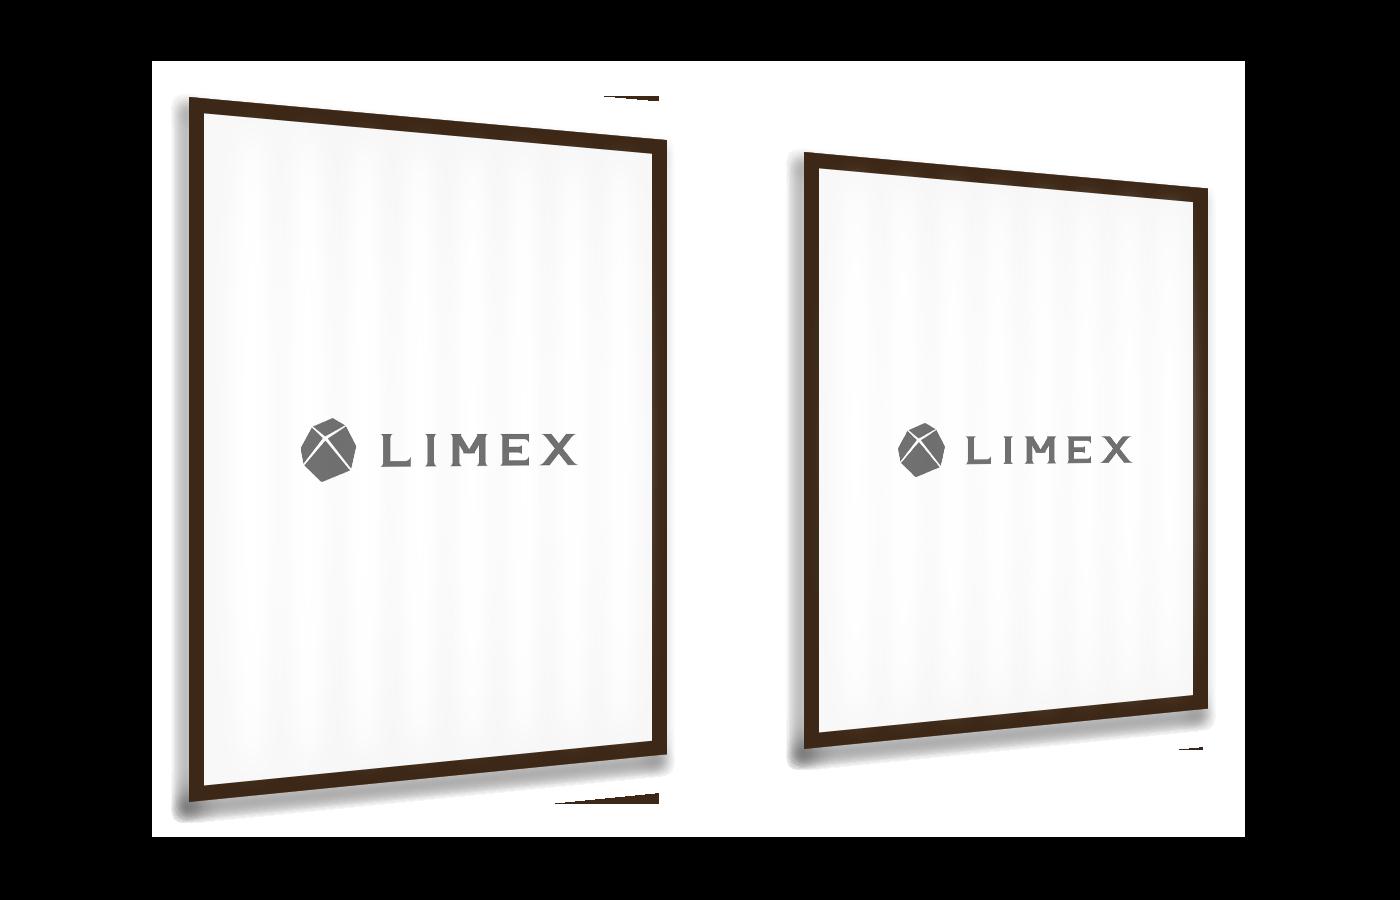 LIMEX Bag。ビニール袋でも紙袋でもない。石から生まれた新しい袋